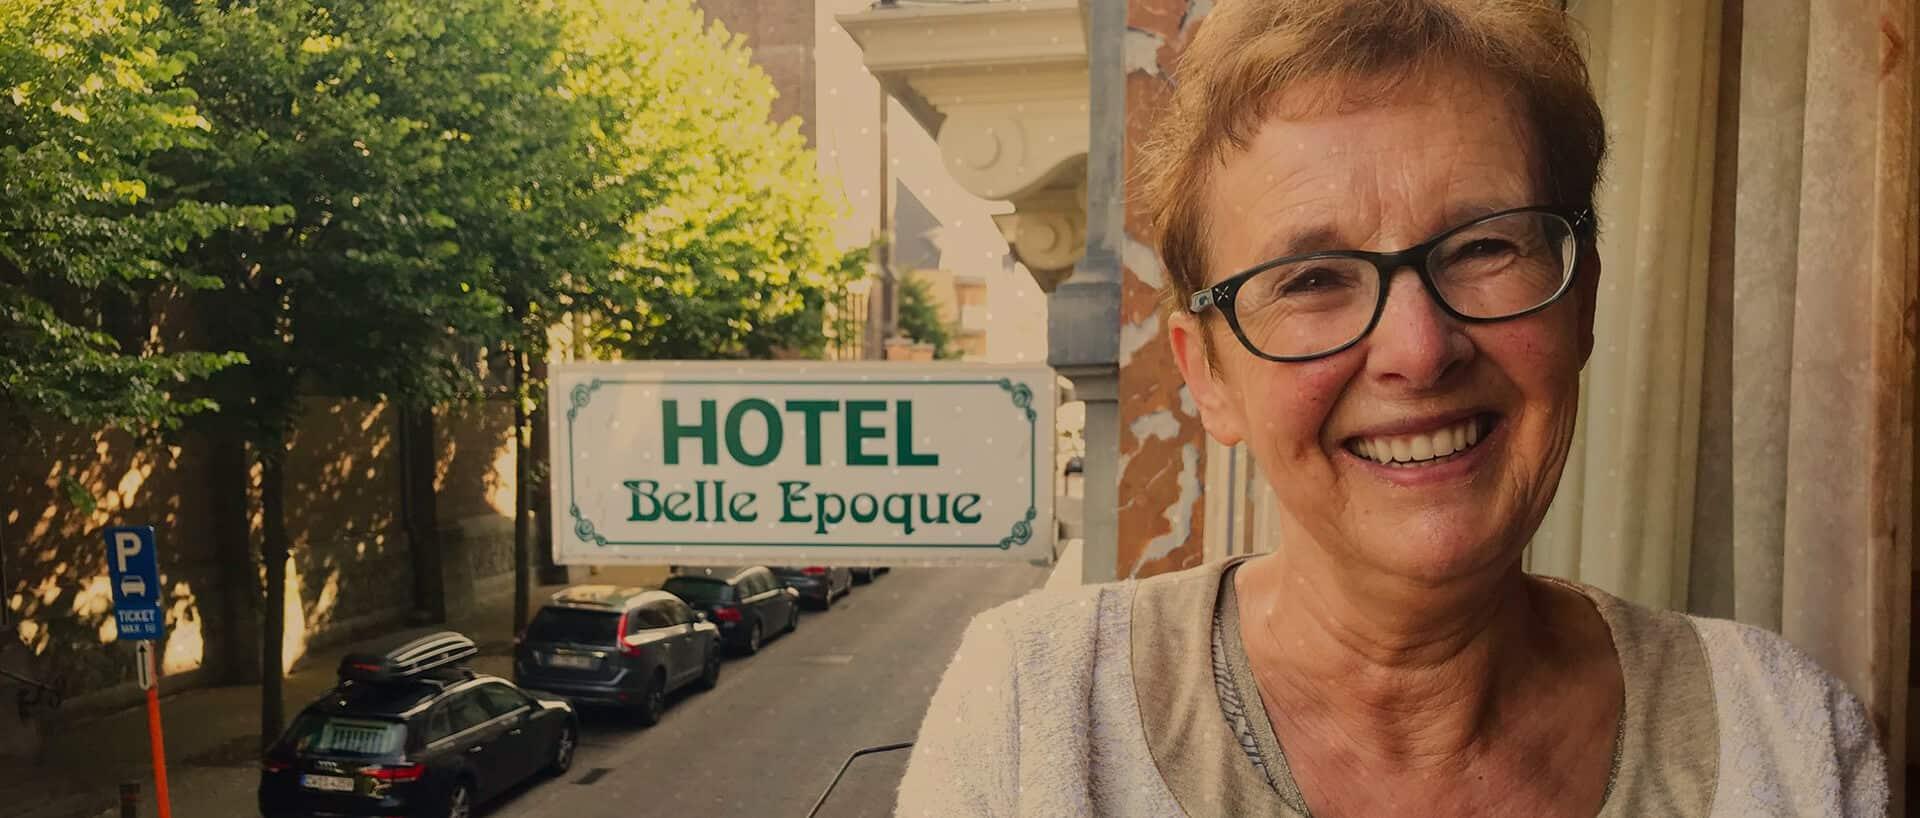 Testimonial hotel Belle Epoque in Blankenberge